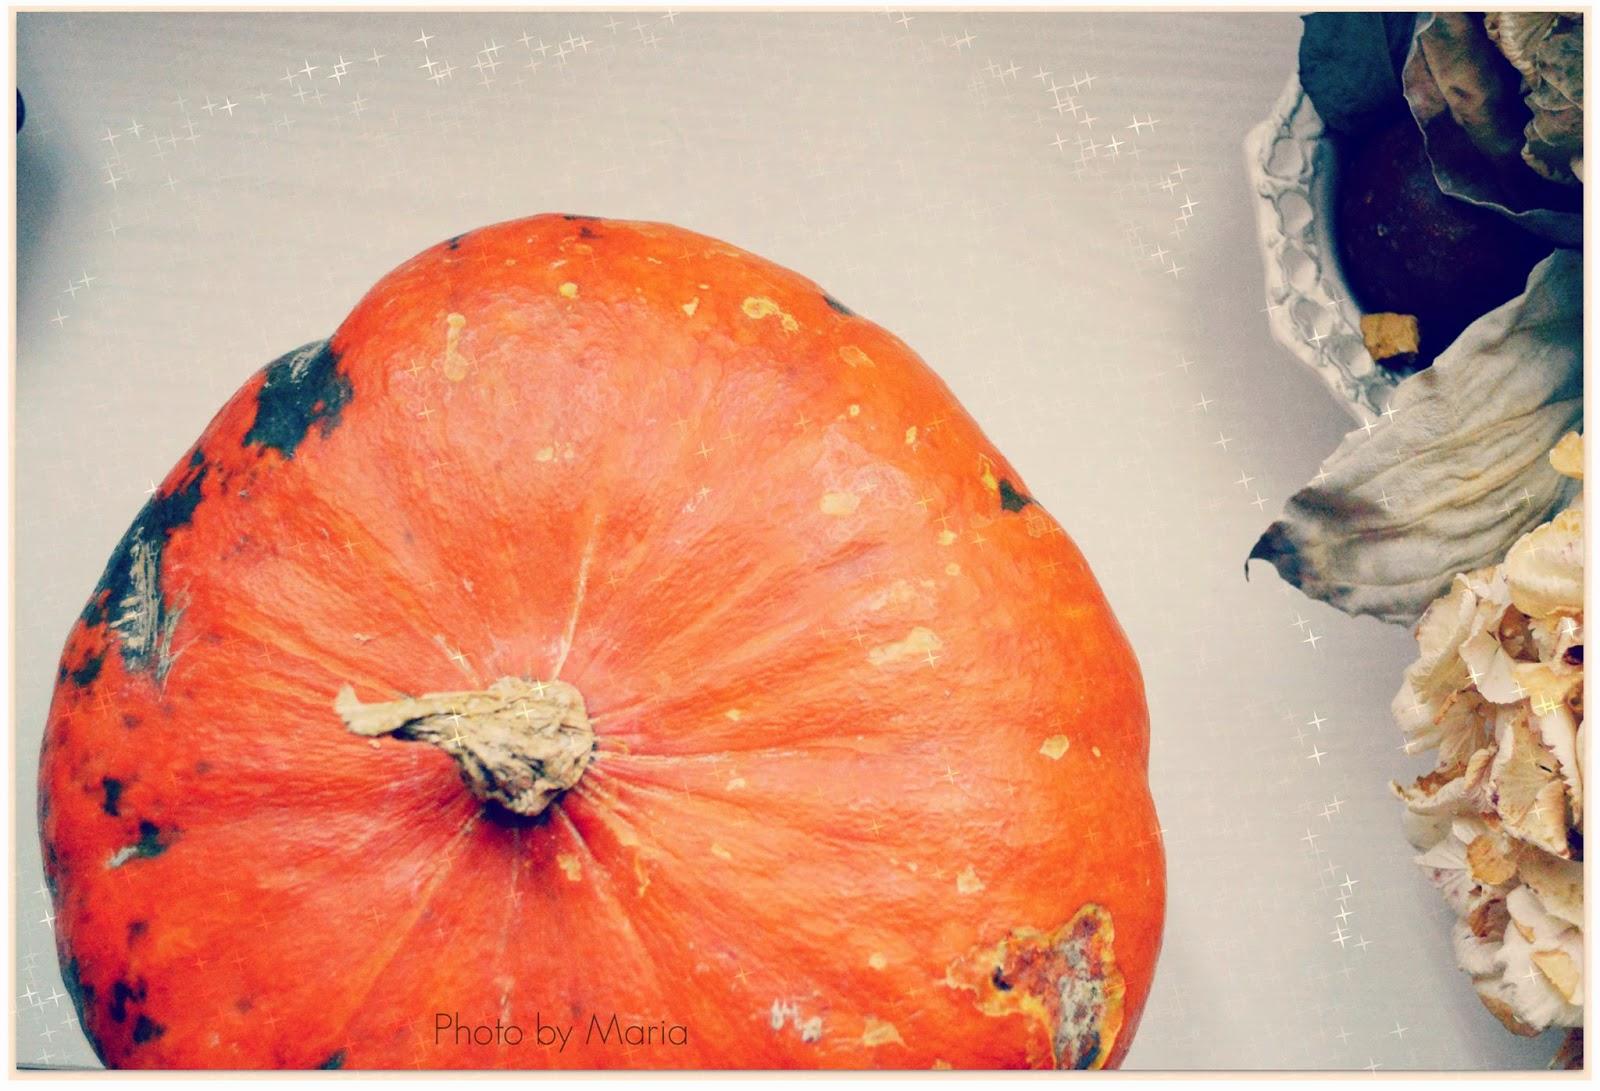 http://gardeningthings.blogspot.it/2014/10/la-zucca-nella-tradizione-sarda.html